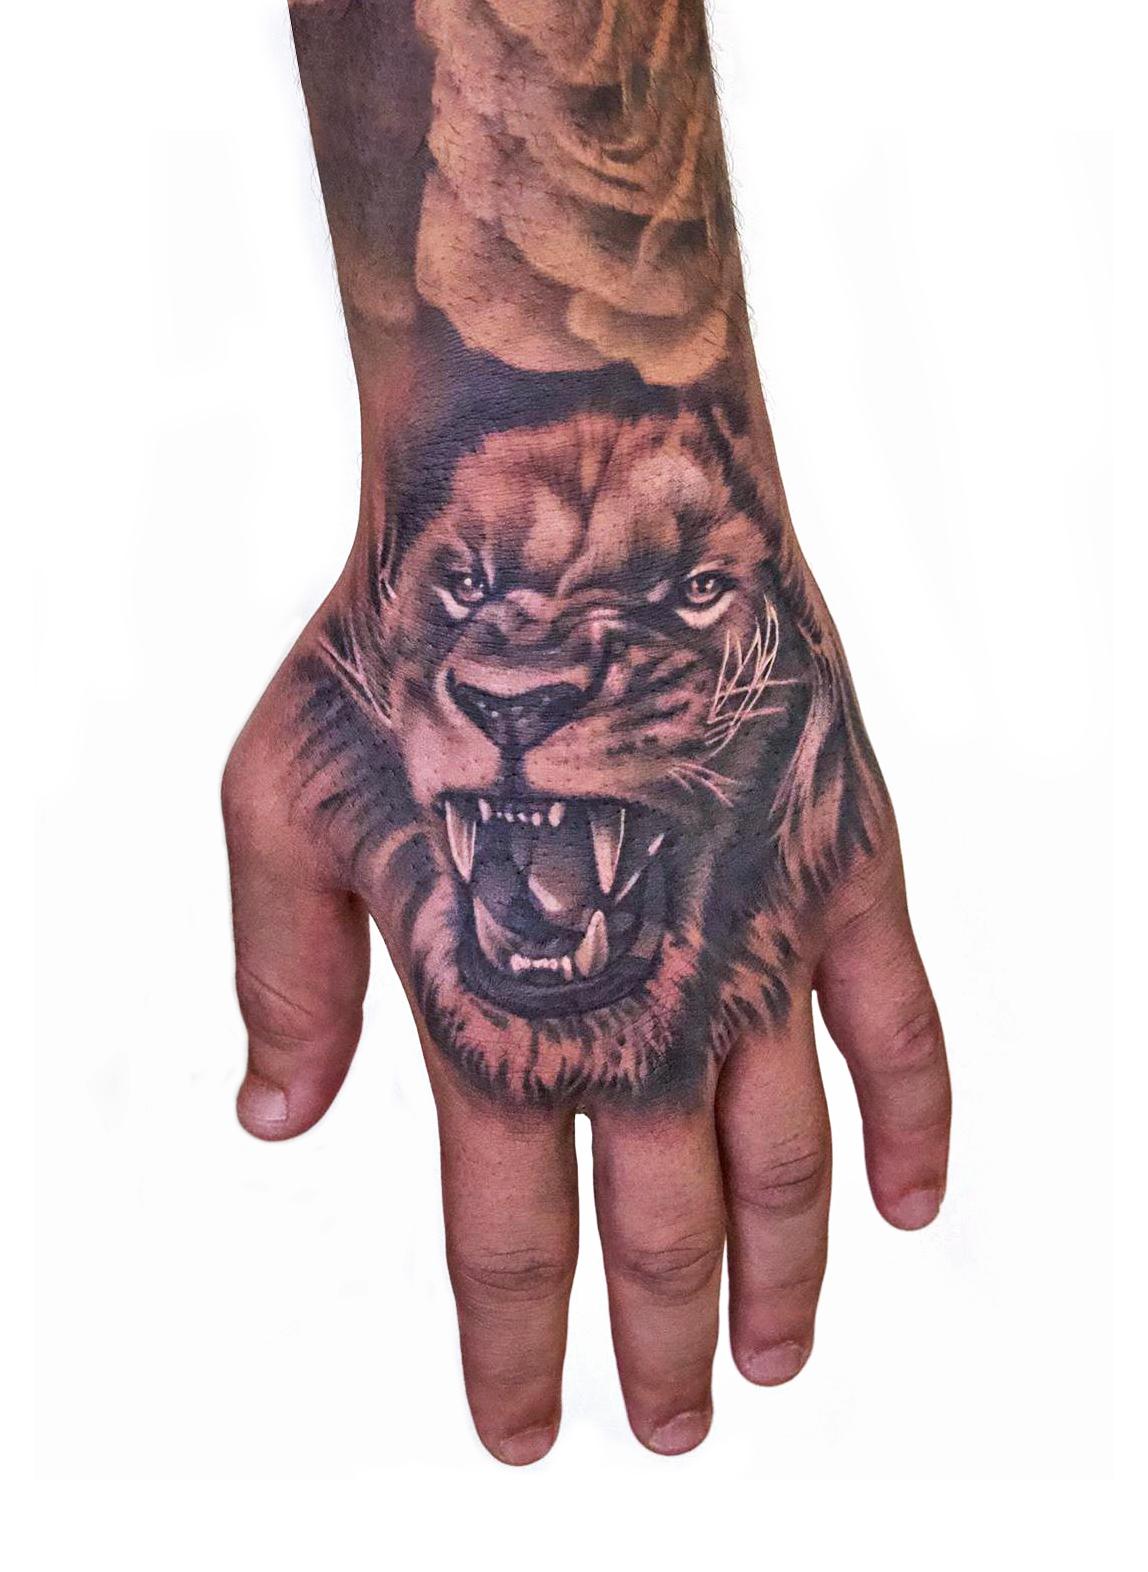 Black and Grey Tattoo Toronto